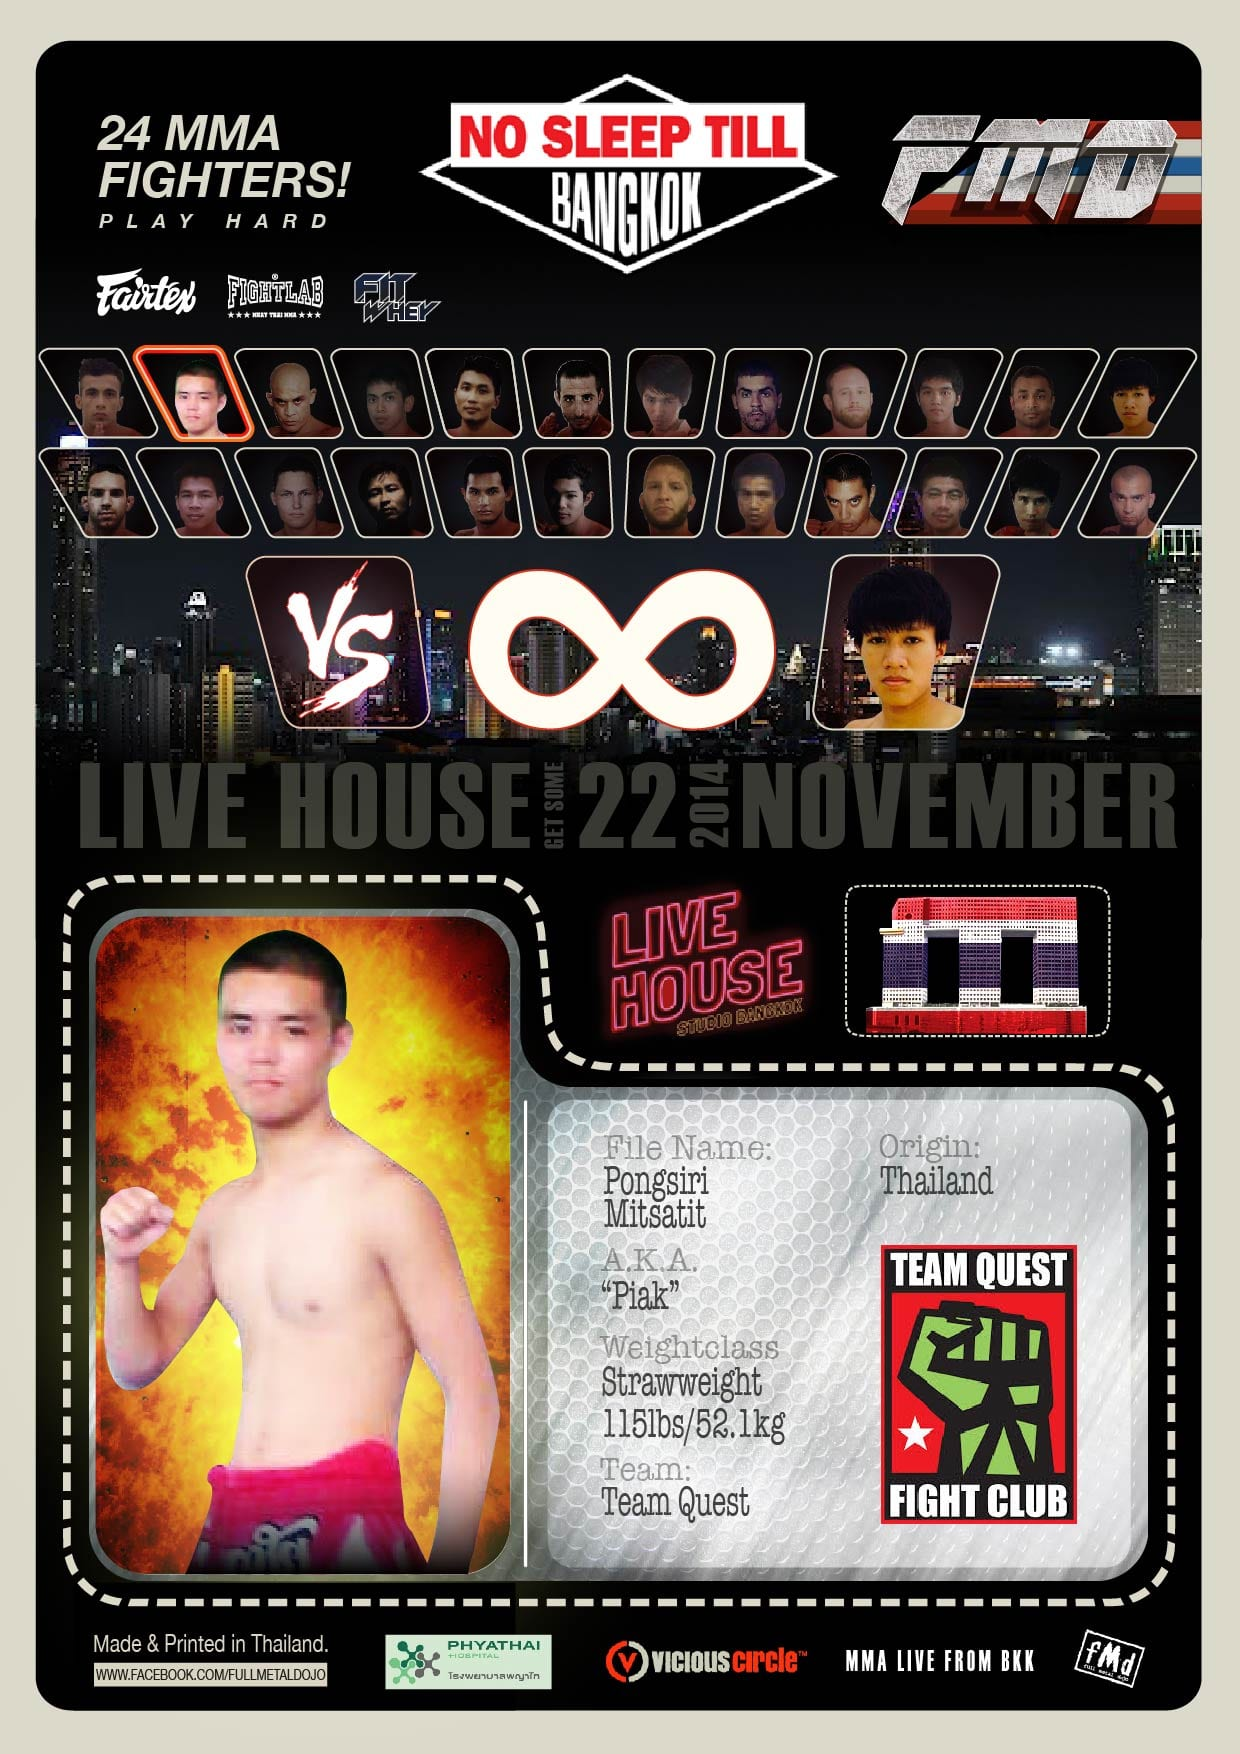 Pongsiri Piak Mitsatit MMA Fighter